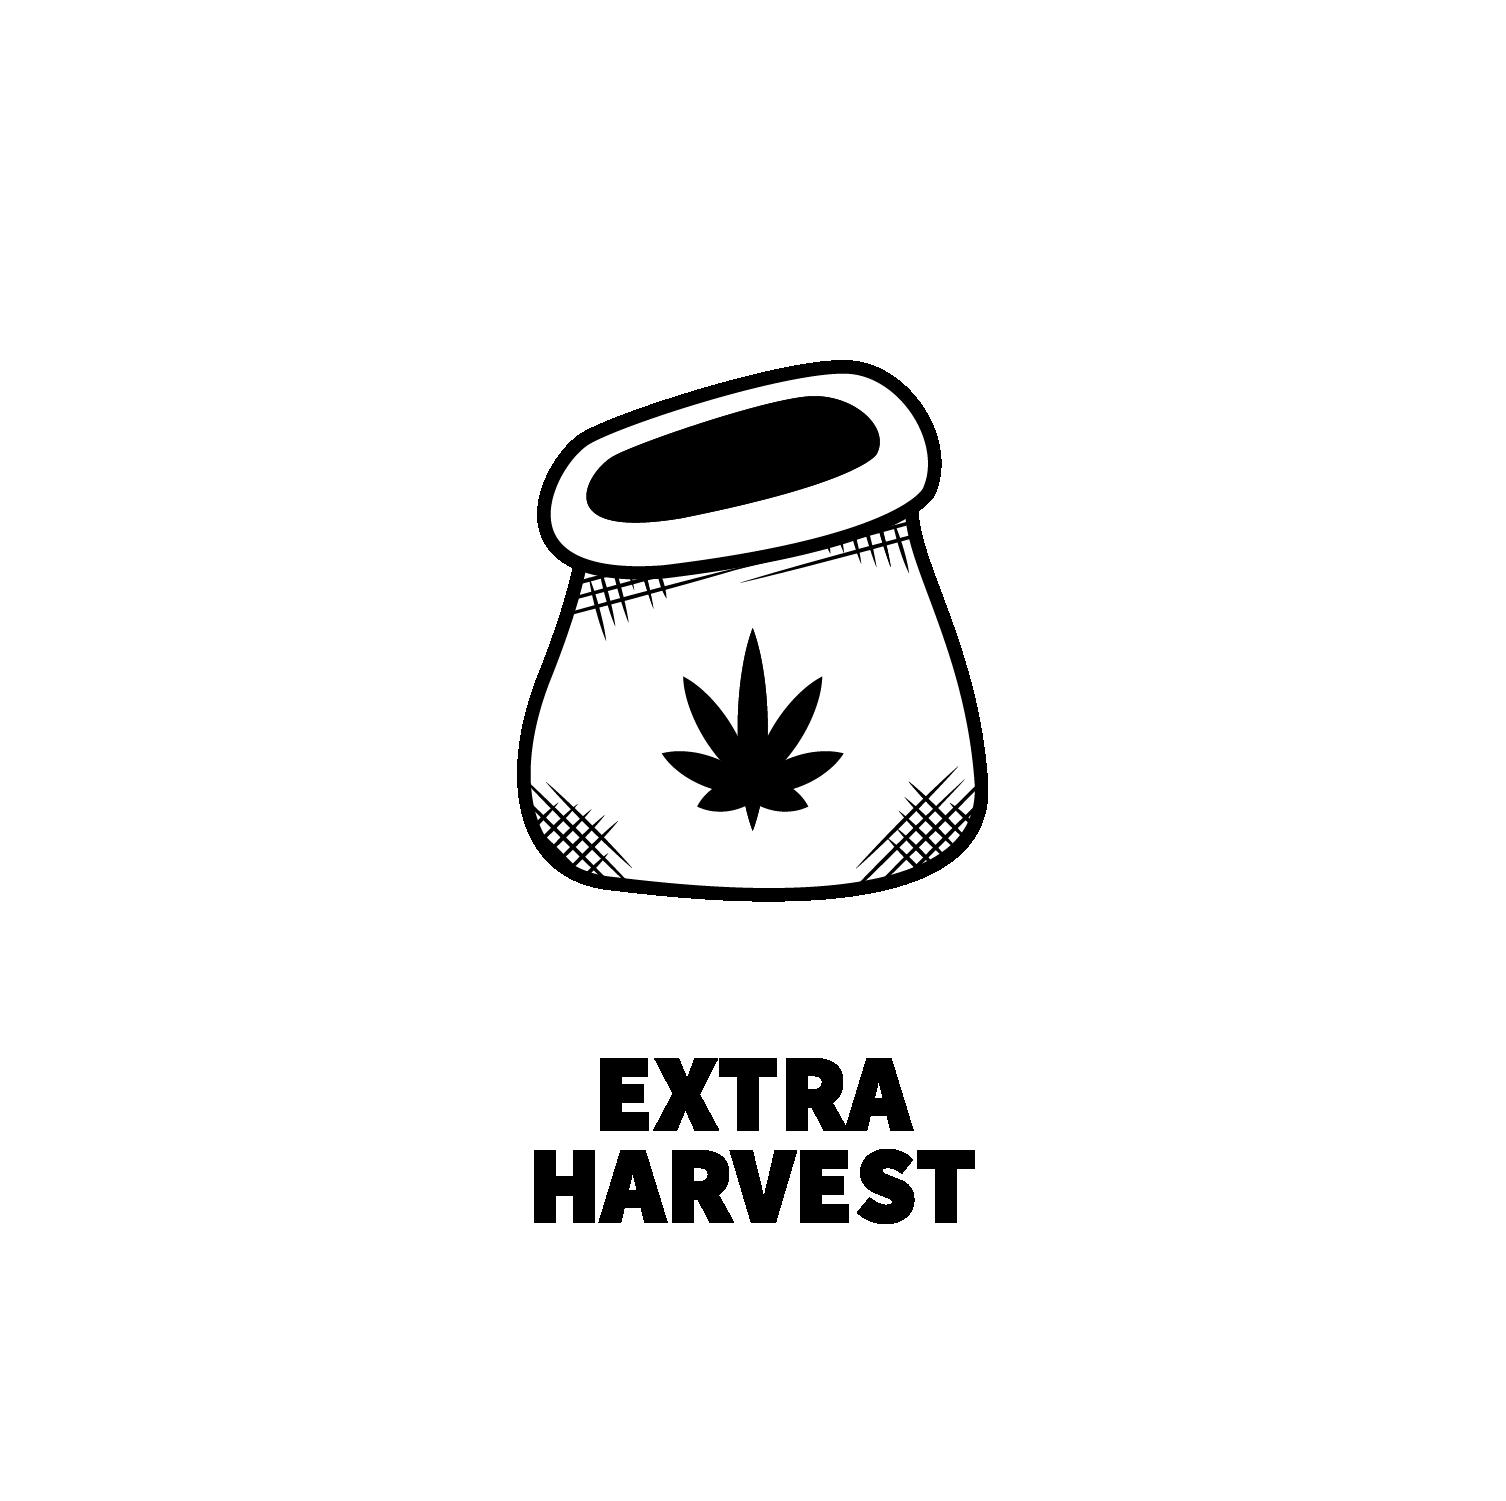 harvets-01.png